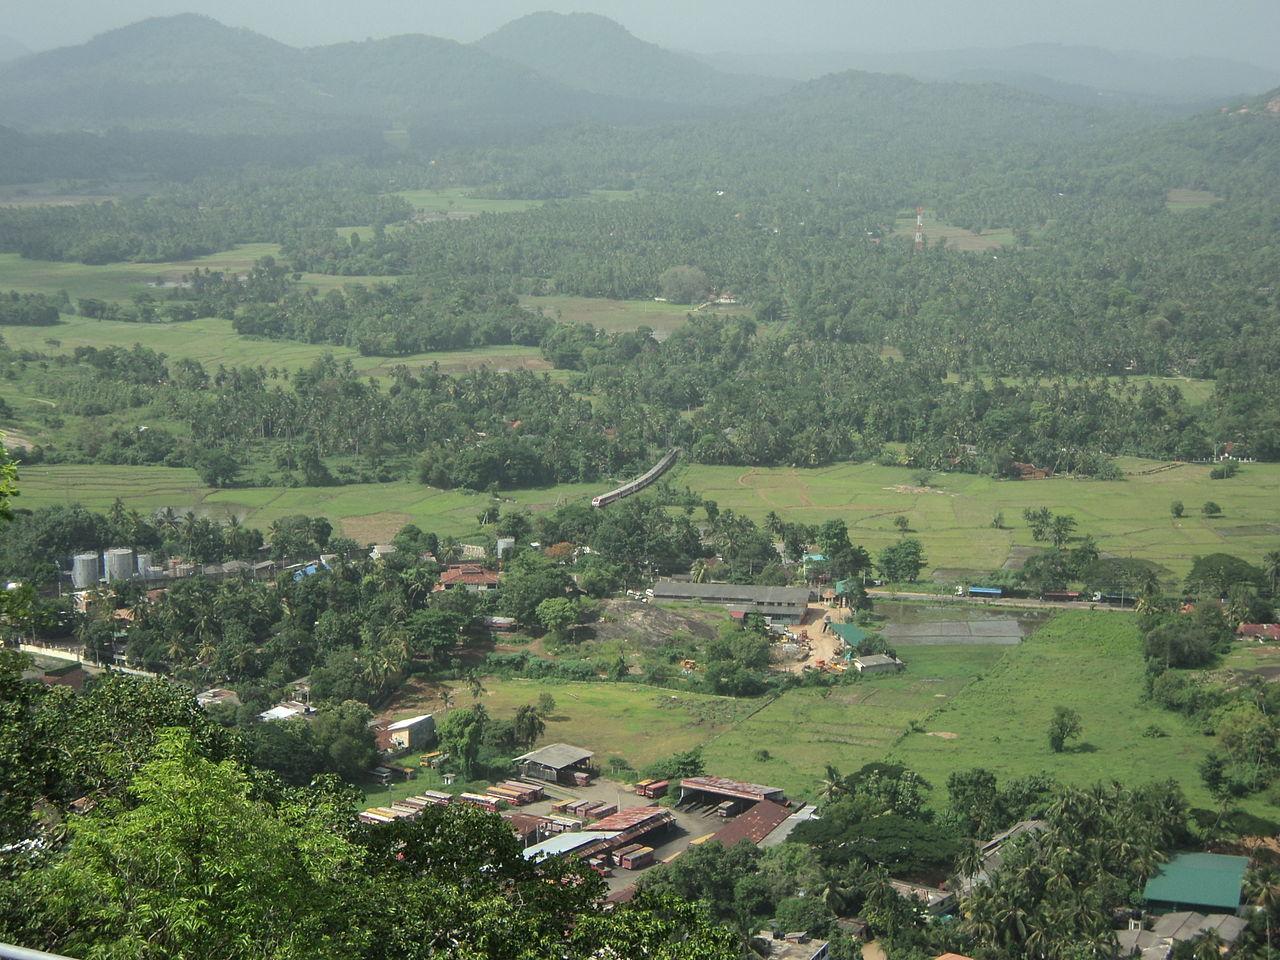 Kurunegala, Sri Lanka dating